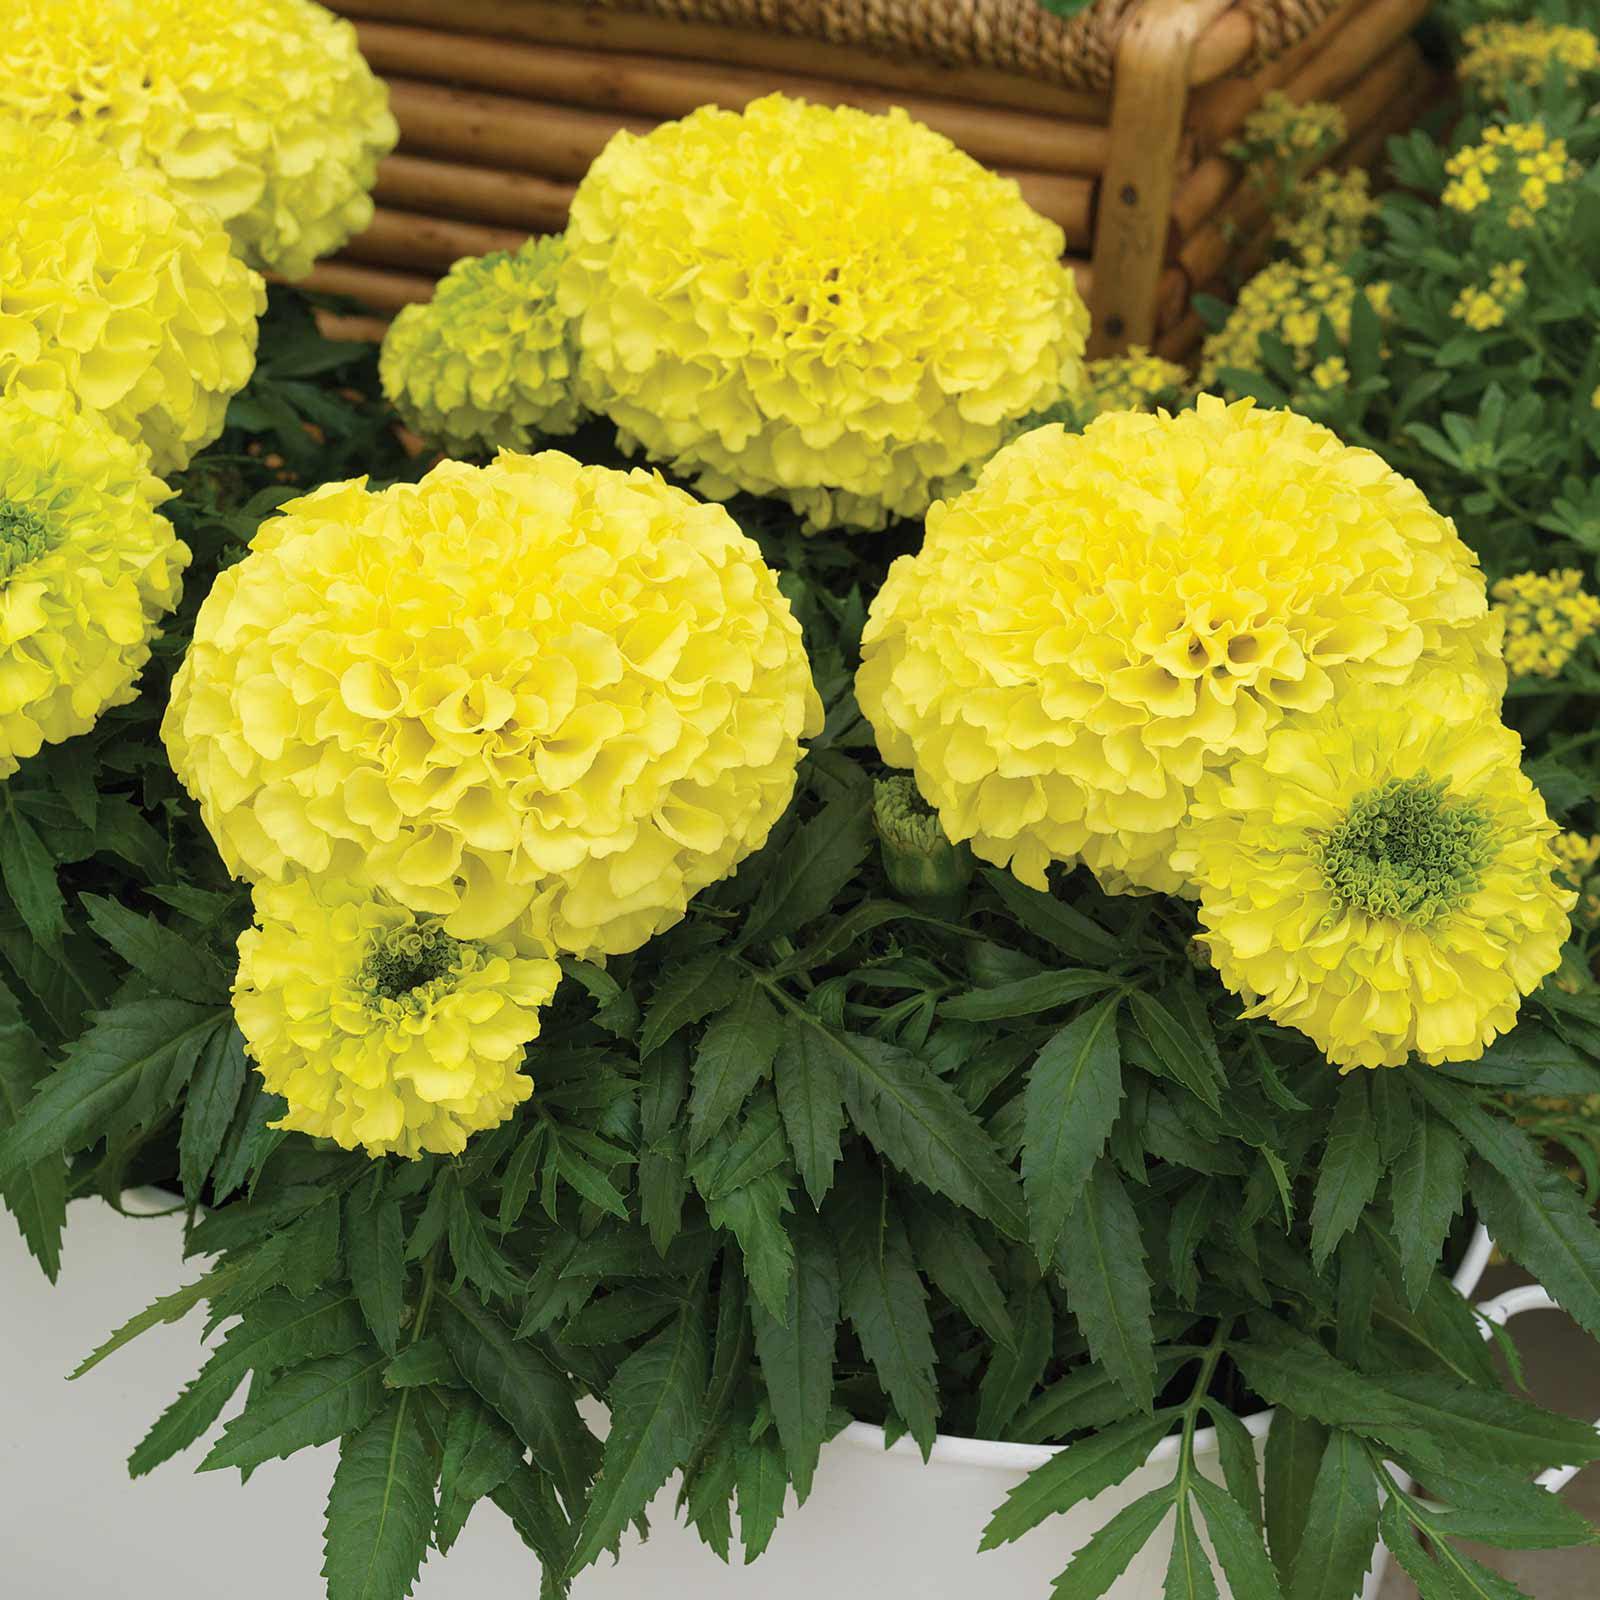 African Marigold Flower Garden Seeds - Antigua Series F1 - Primrose - 100 Seeds - Annual Flower Gardening Seeds - Tagetes erecta